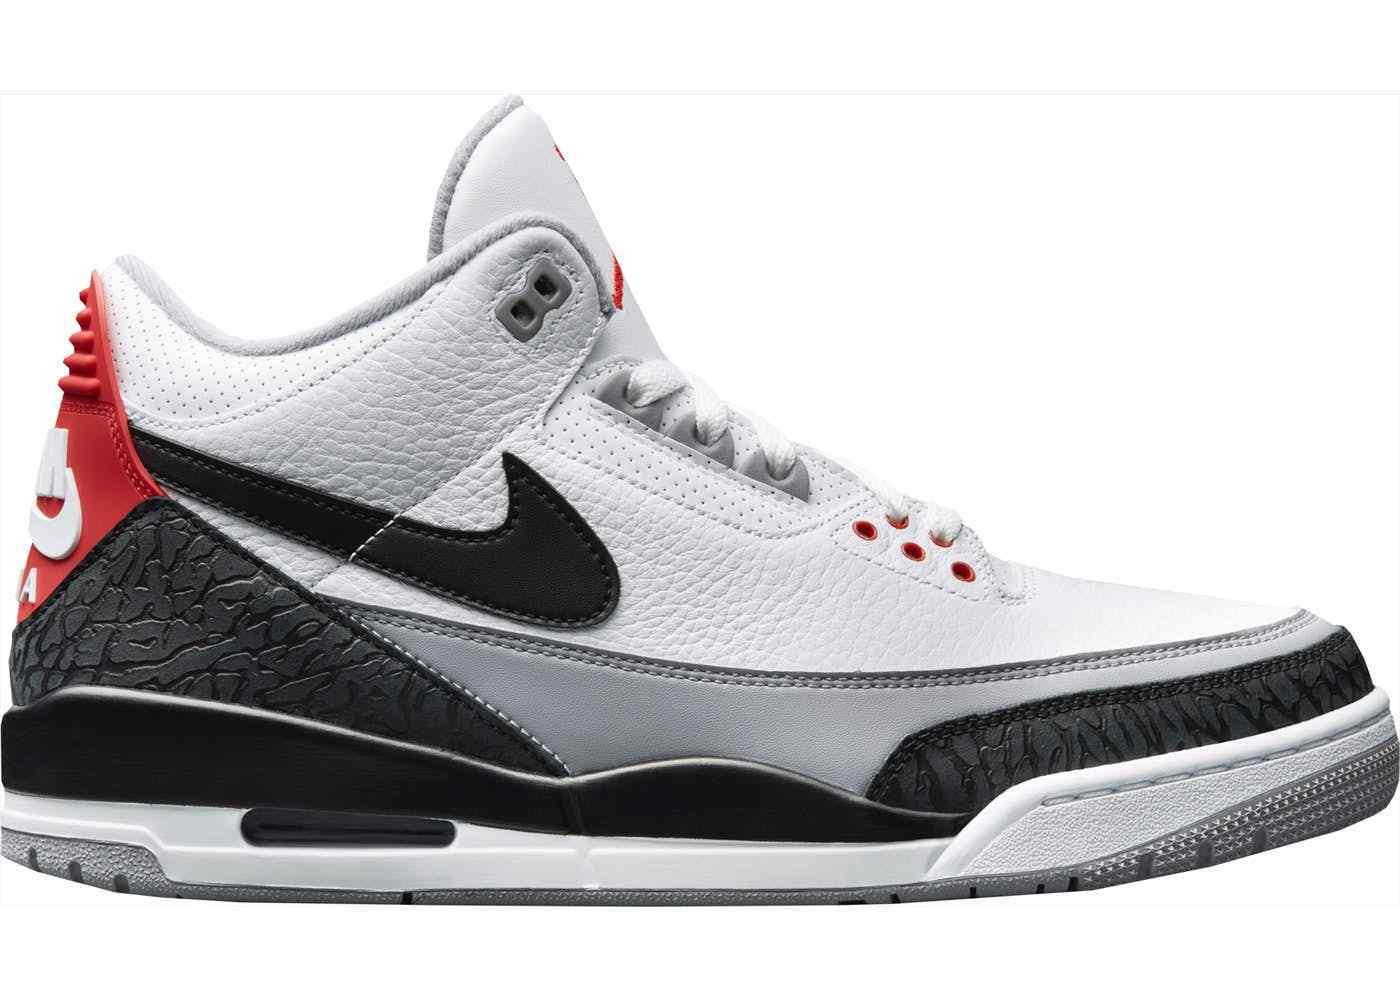 Nike Air Jordan 3 III Retro Tinker NRG Size 11.5. AQ3835-160